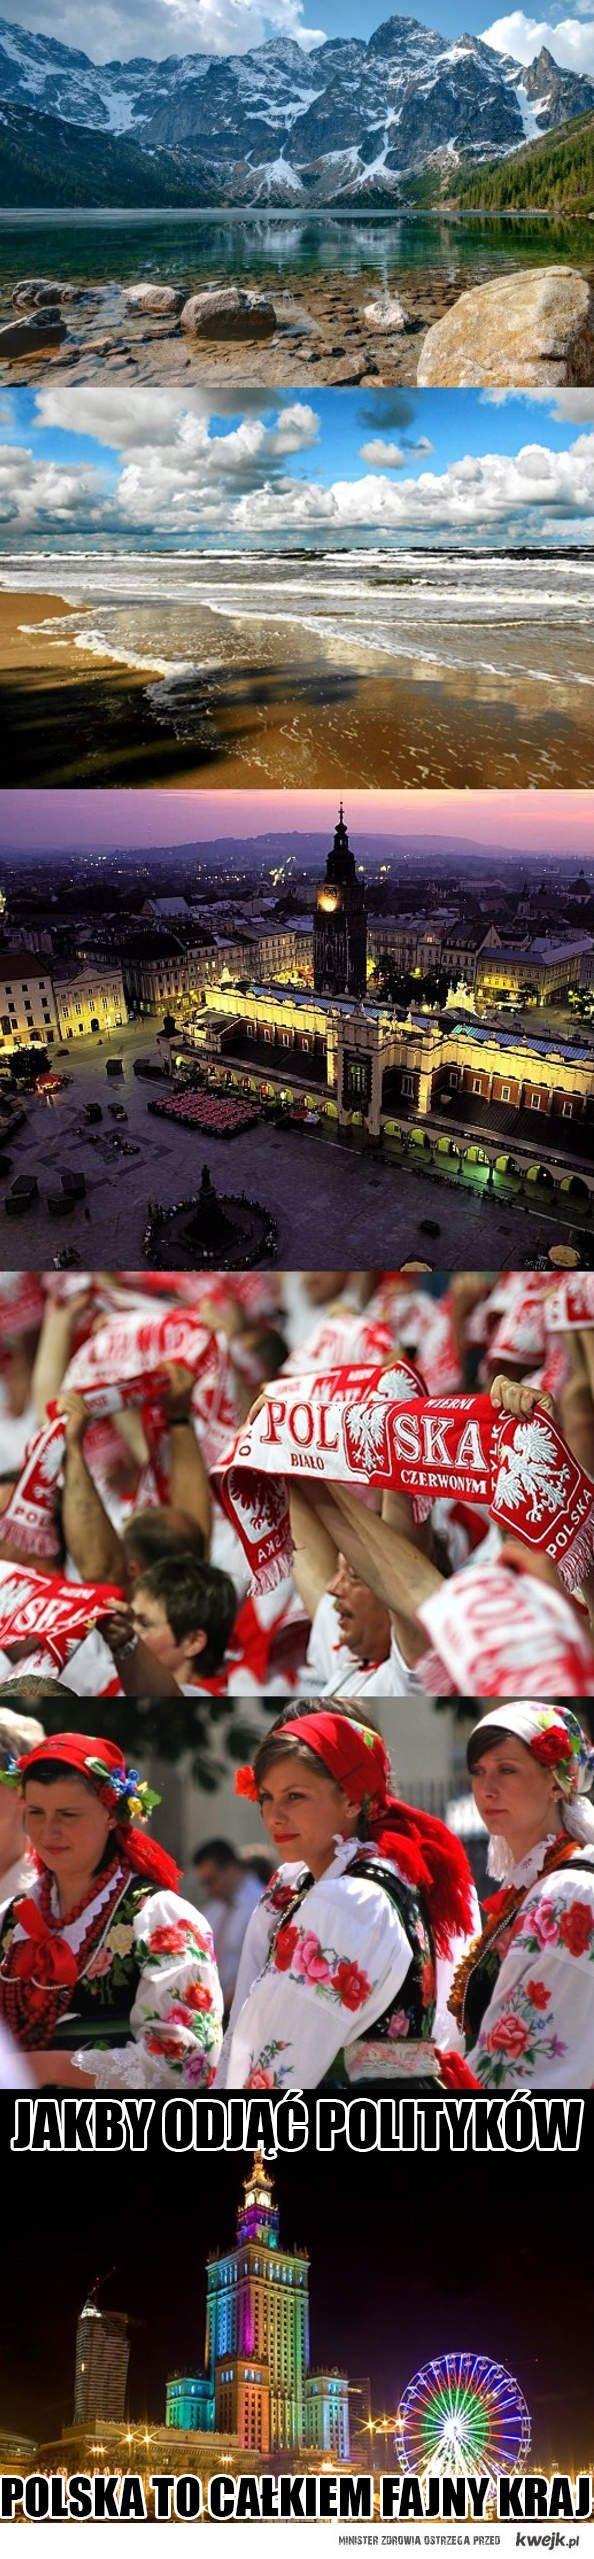 Me meaning of polish flag - Polska